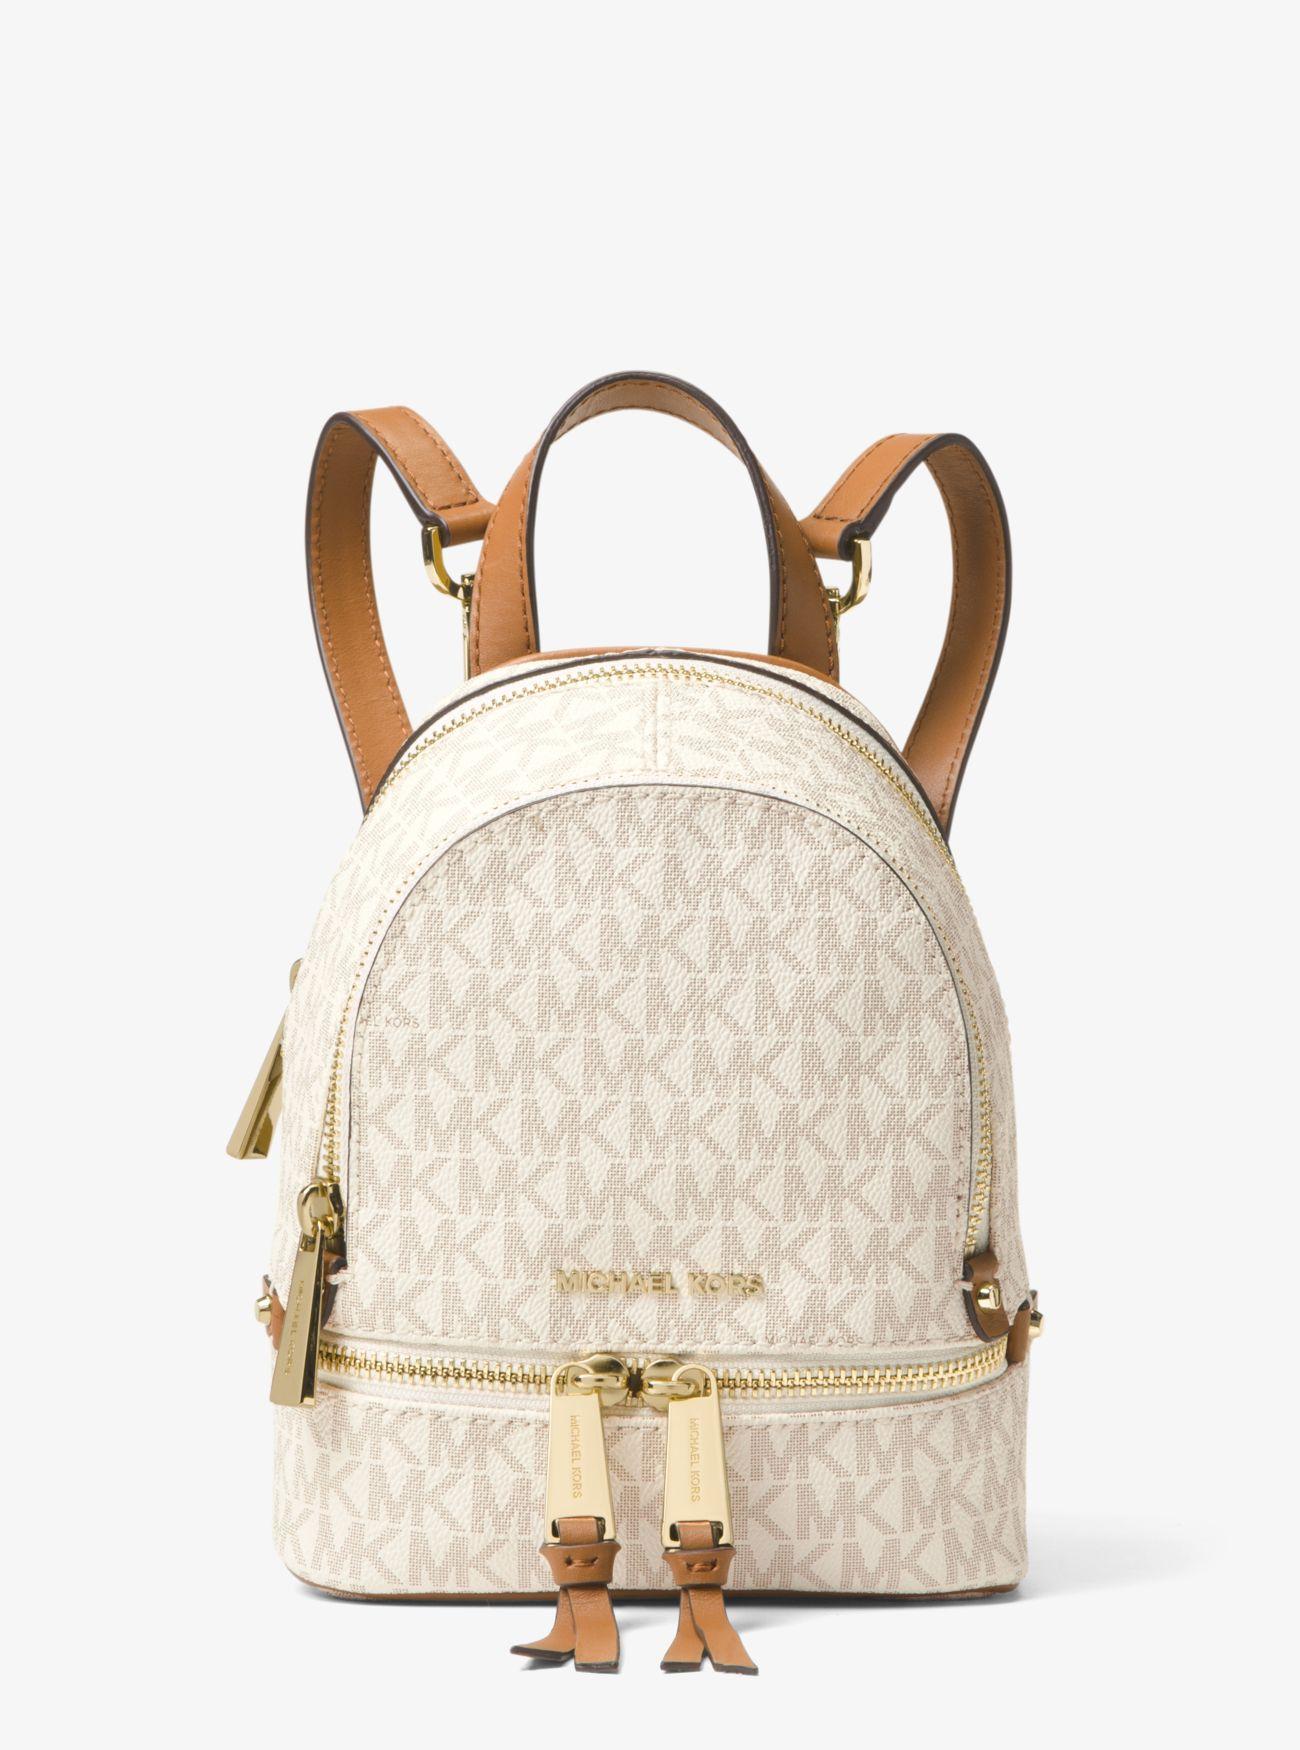 bfced6a2d1a1 Michael Kors. Women s Rhea Mini Logo Backpack